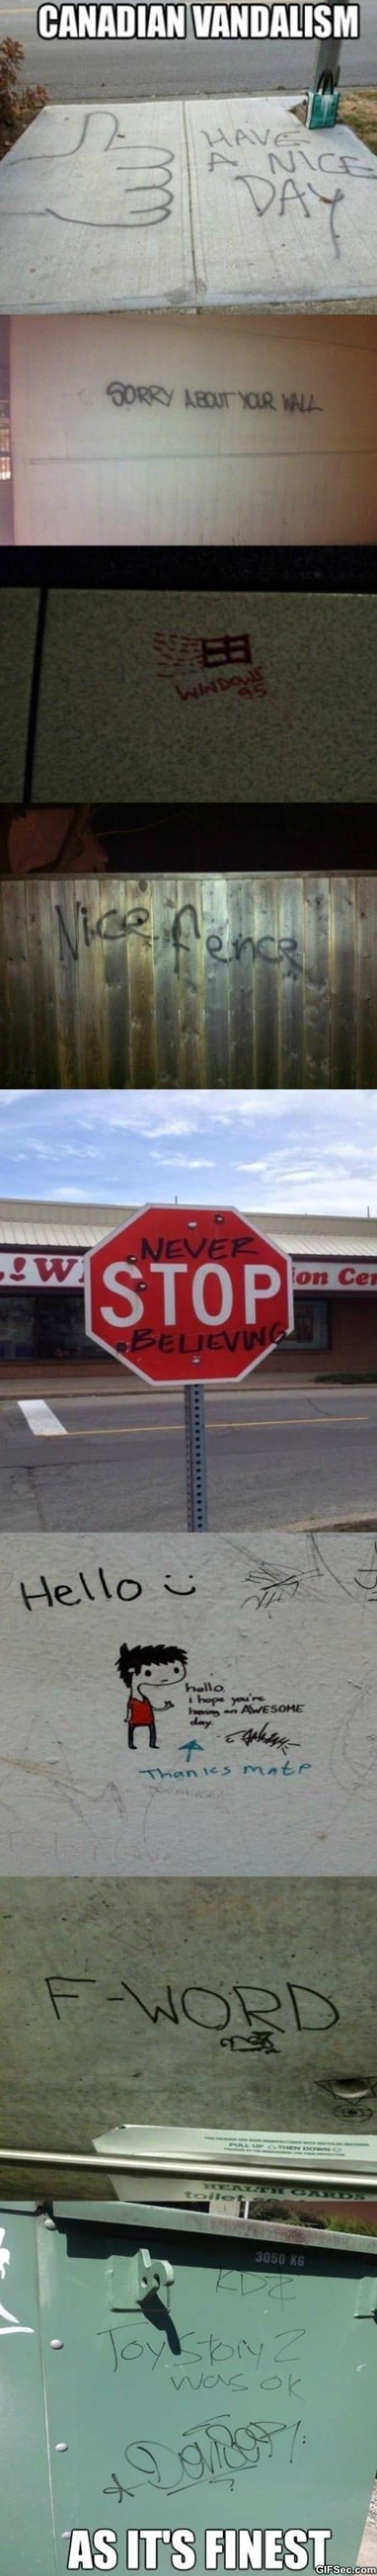 funny-canadian-vandalism-memes